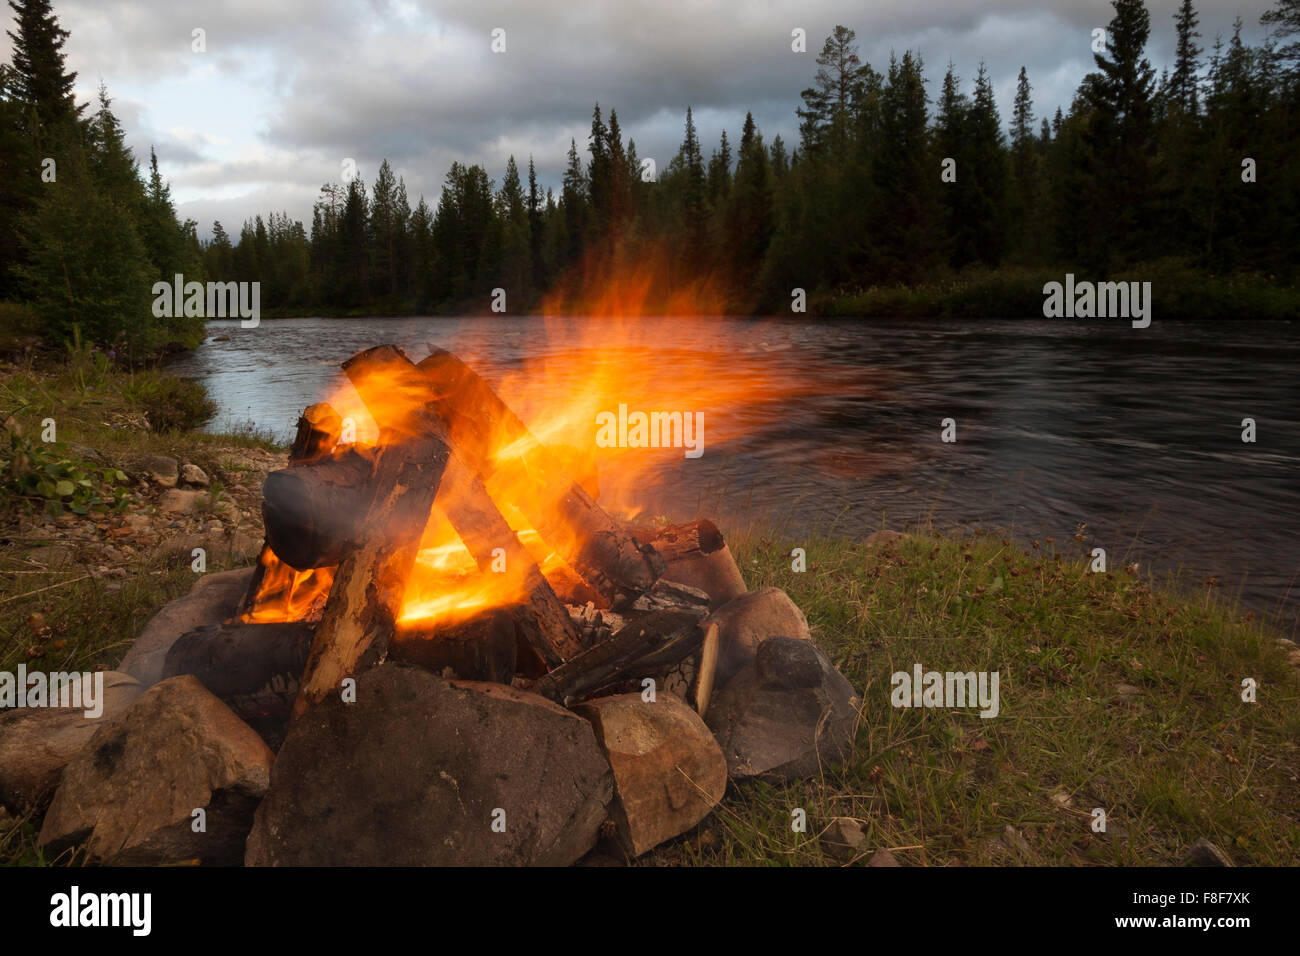 Feu, feu, feu de camp, camping, romantique, Lagerfeuer, Feuer, extérieur, Feuerstelle, Campen, Schweden Skandinavien, romantisch, Banque D'Images